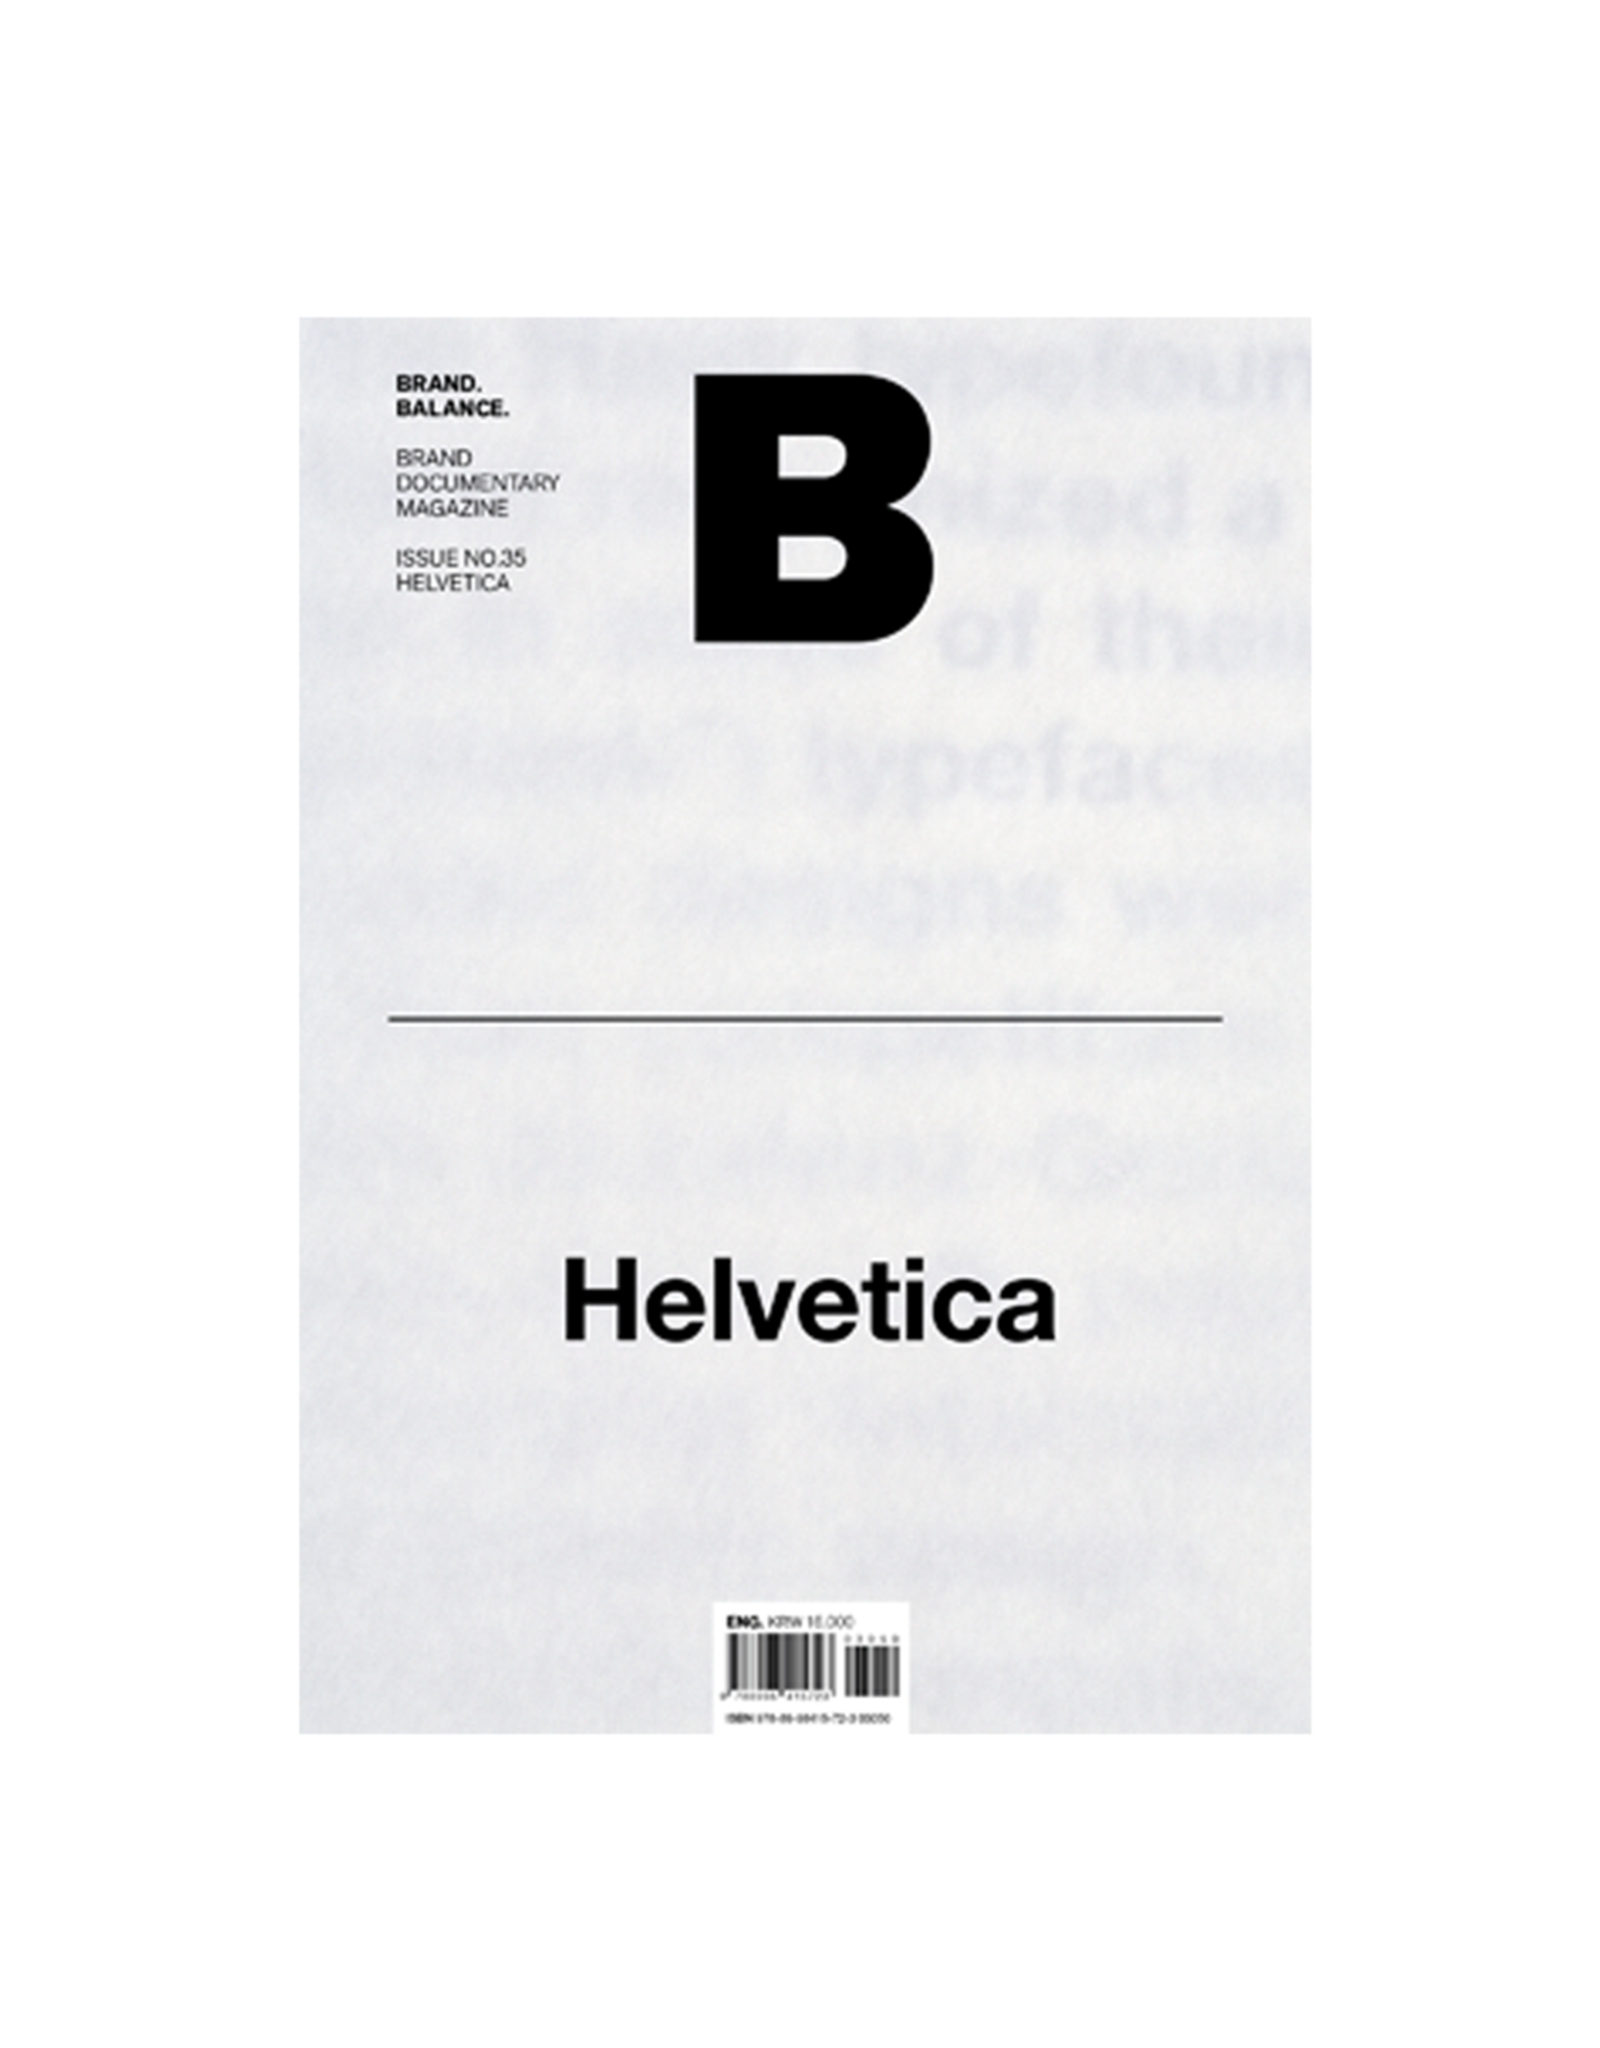 Magazine B, Issue 35 Helvetica